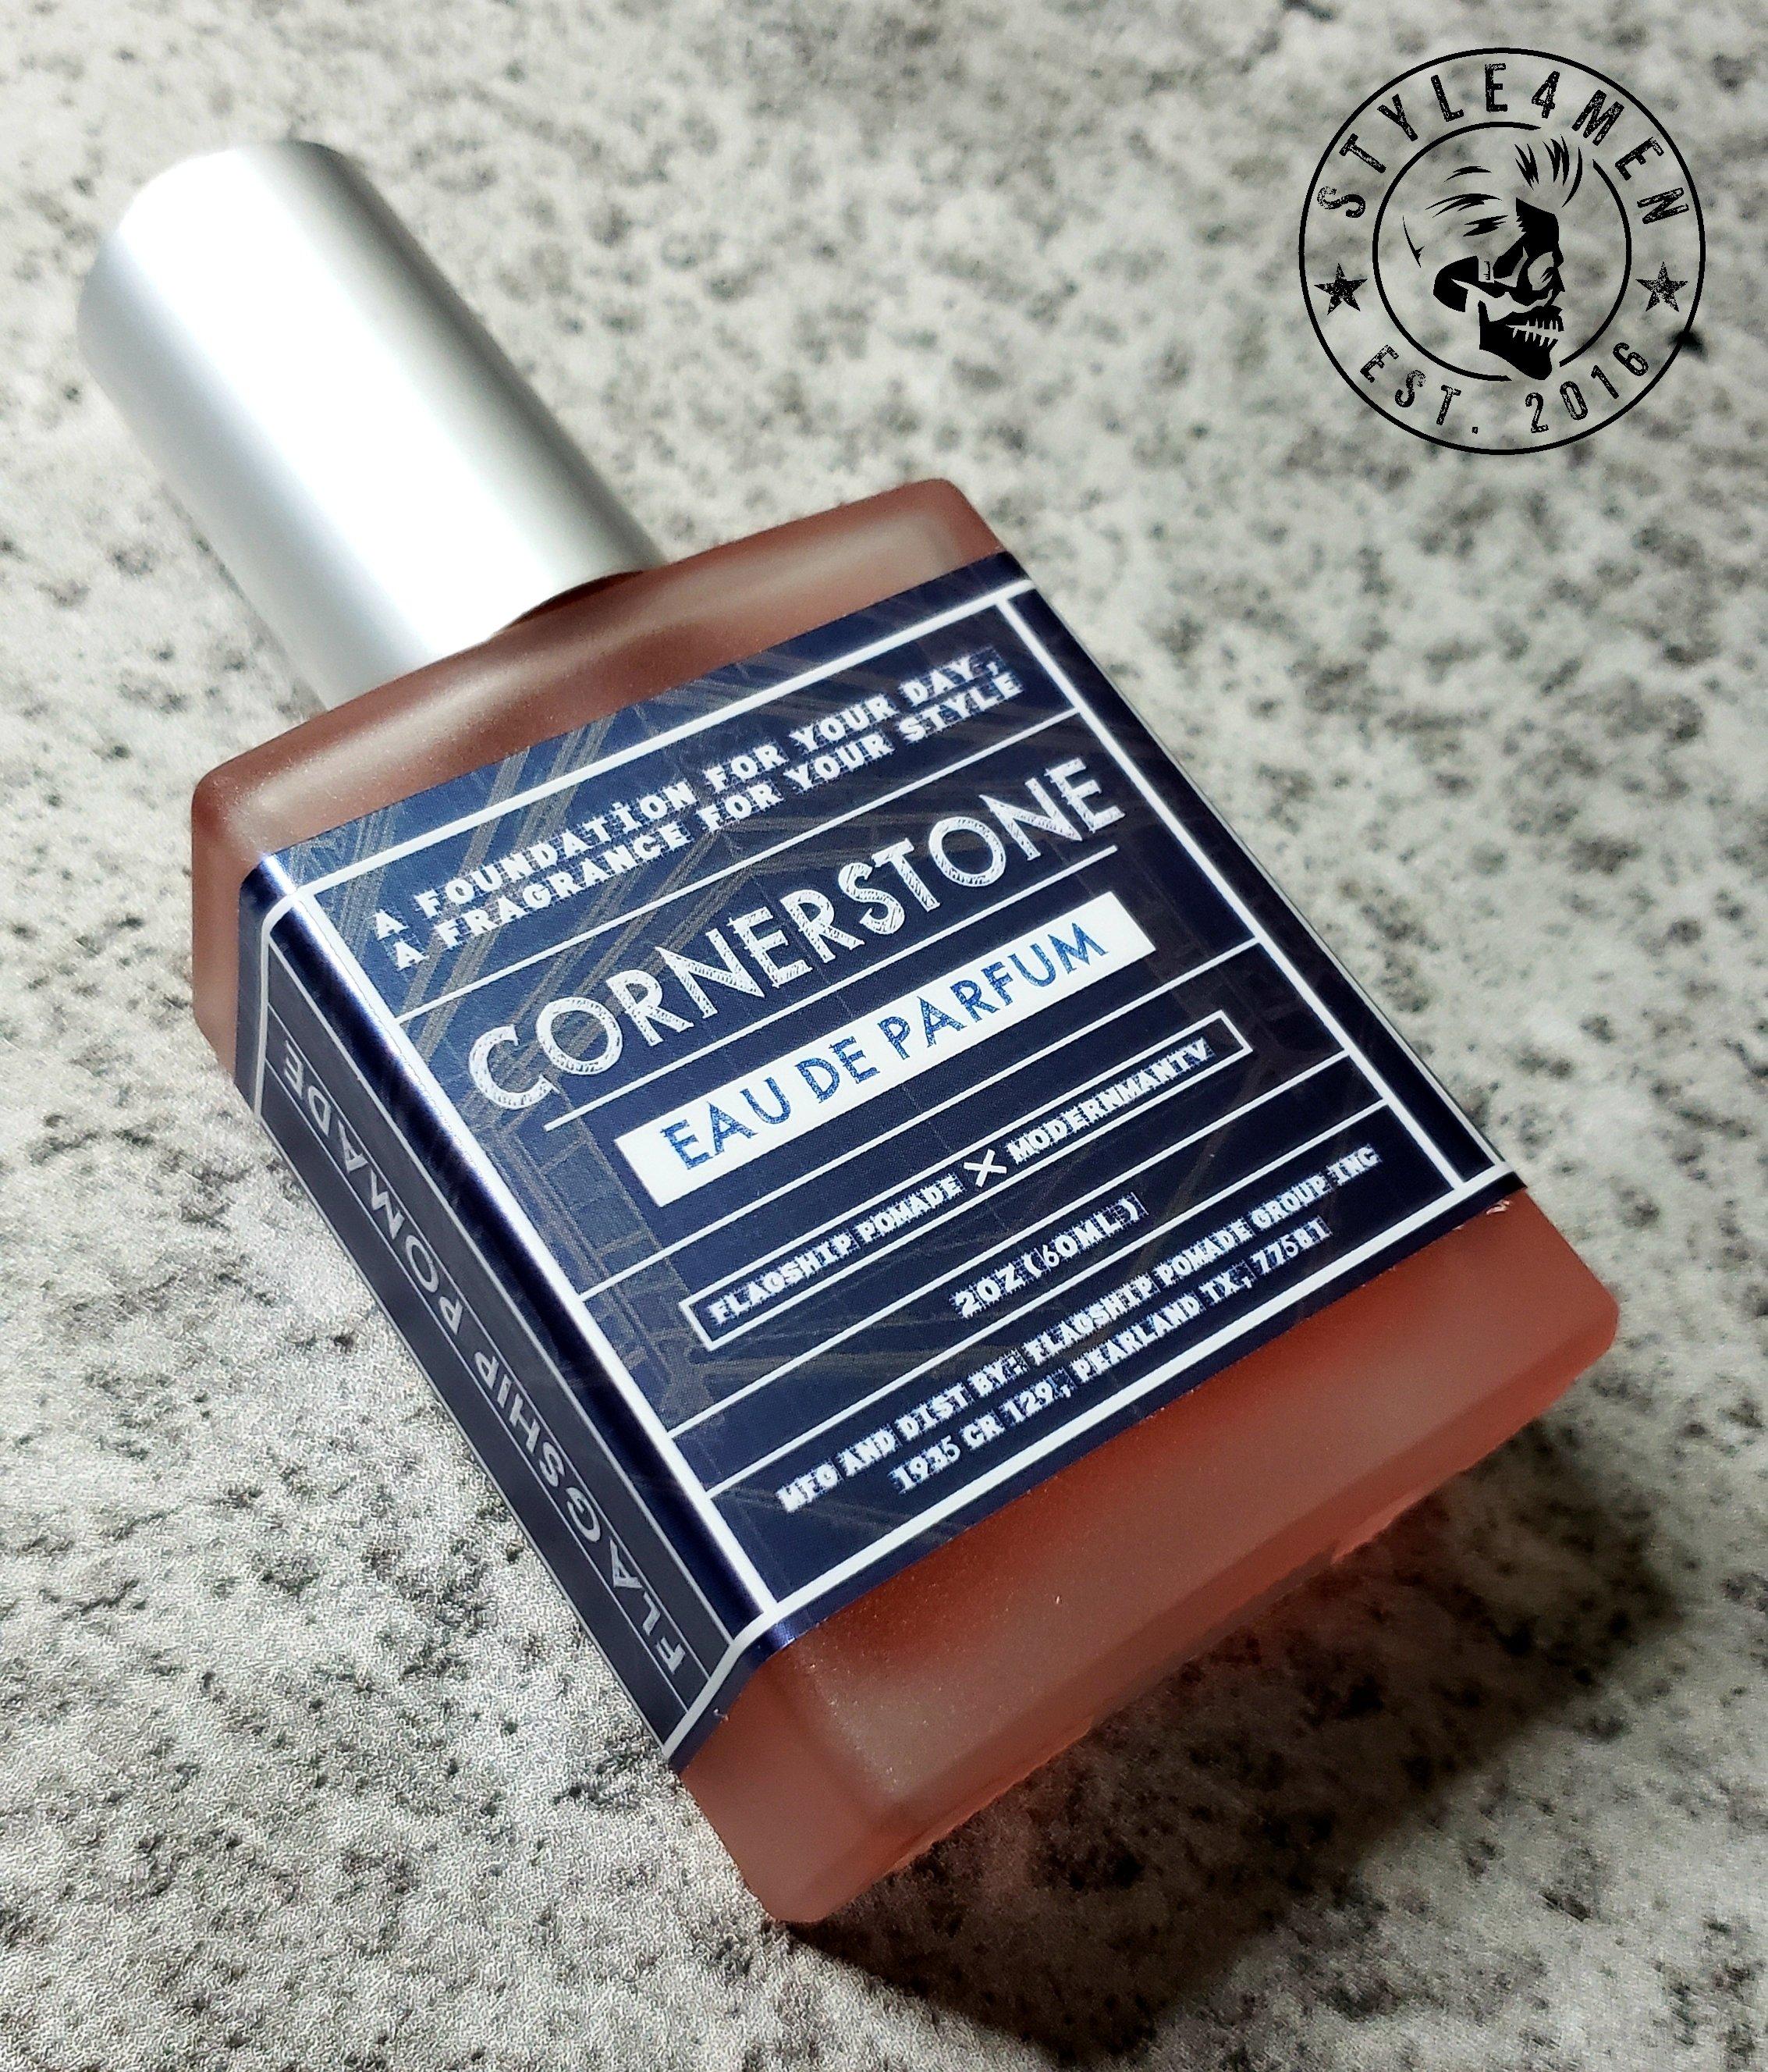 CORNERSTONE eau de parfum by Flagship Pomade & Modernman TV